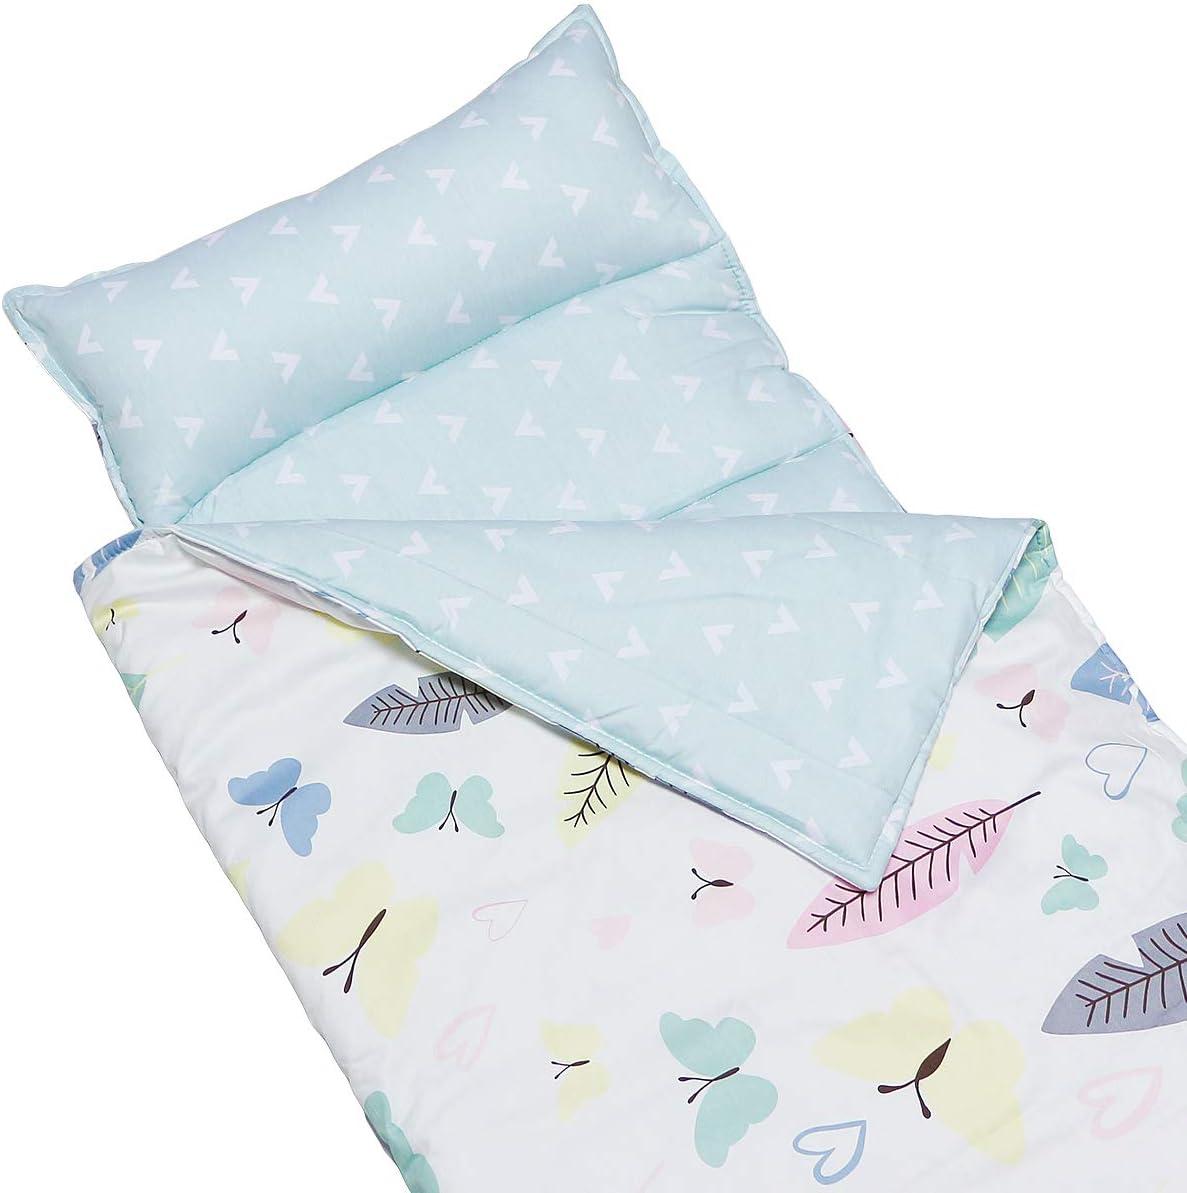 Butterfly2 Hisprout Tapis L/éger et Doux Kids Toddler Minky Dot /& Cotton